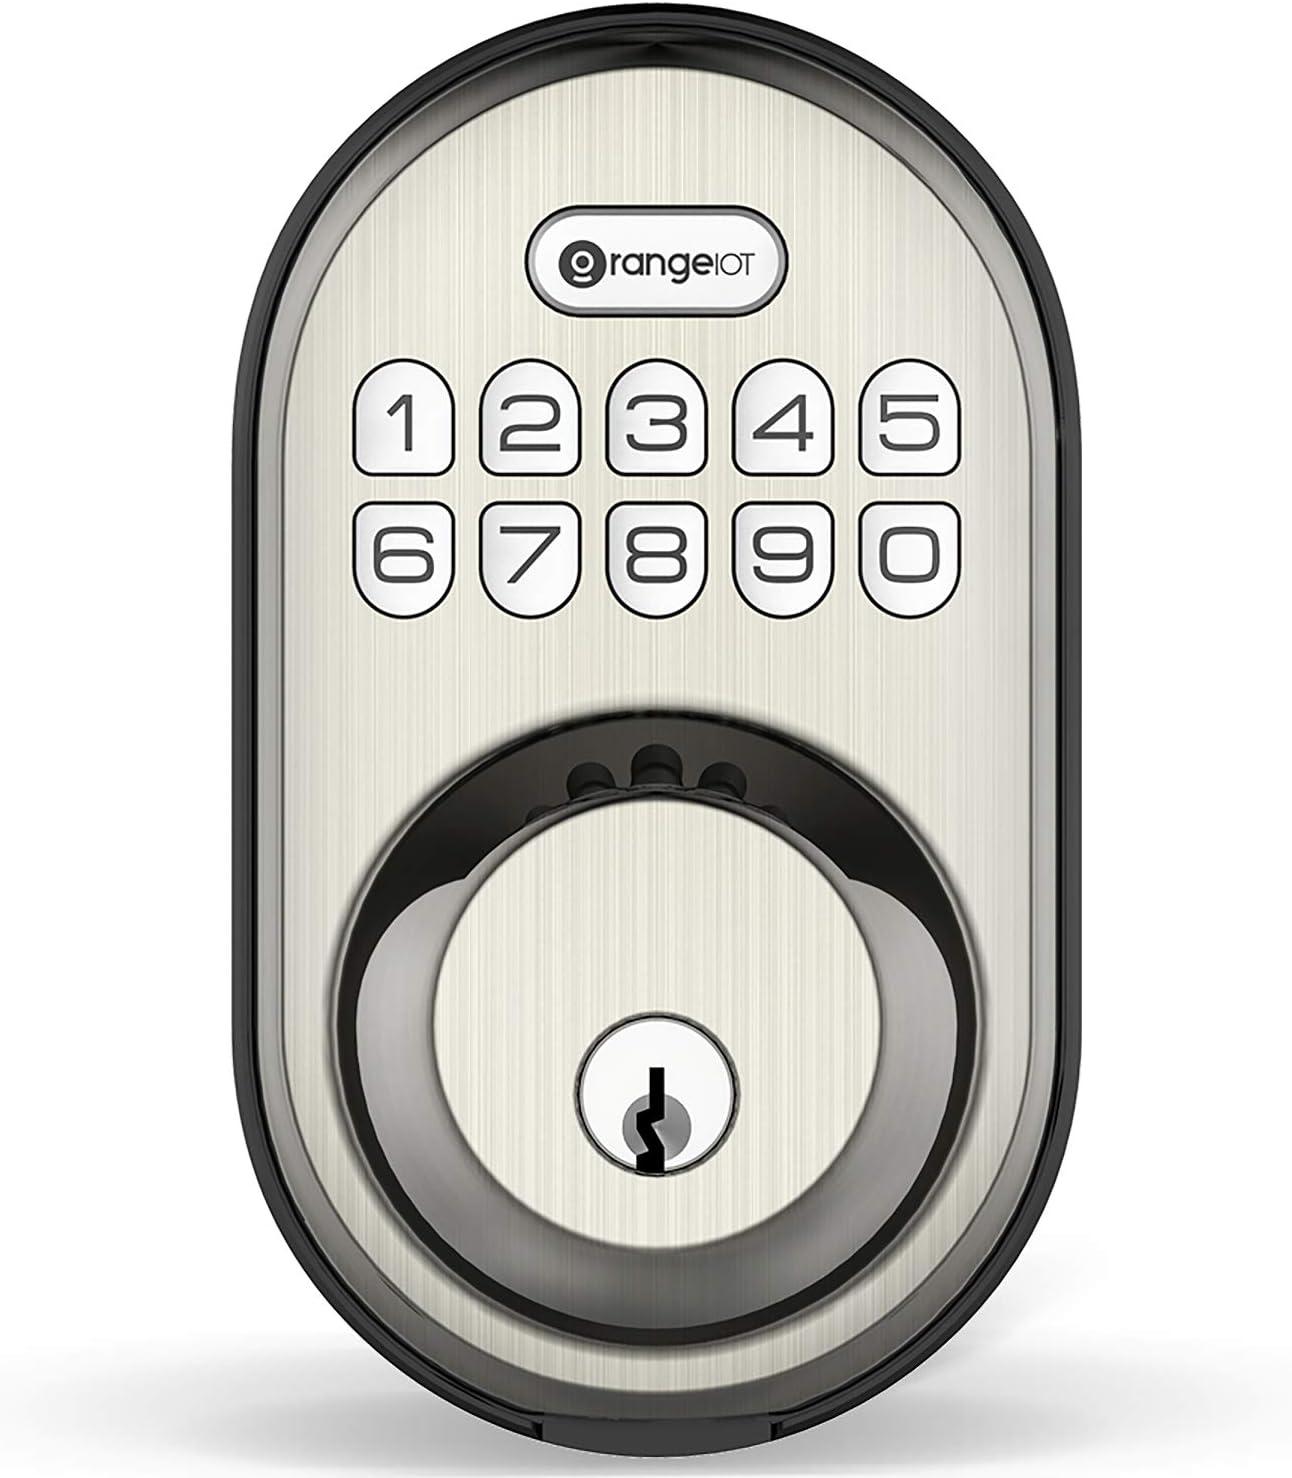 Keyless Entry Deadbolt Lock, Orangeiot Electronic Keypad Door Lock, Auto Lock, 1 Touch Locking, 20 Customizable User Codes, Back Lit, Easy Installation for Front Back Door, Satin Nickel